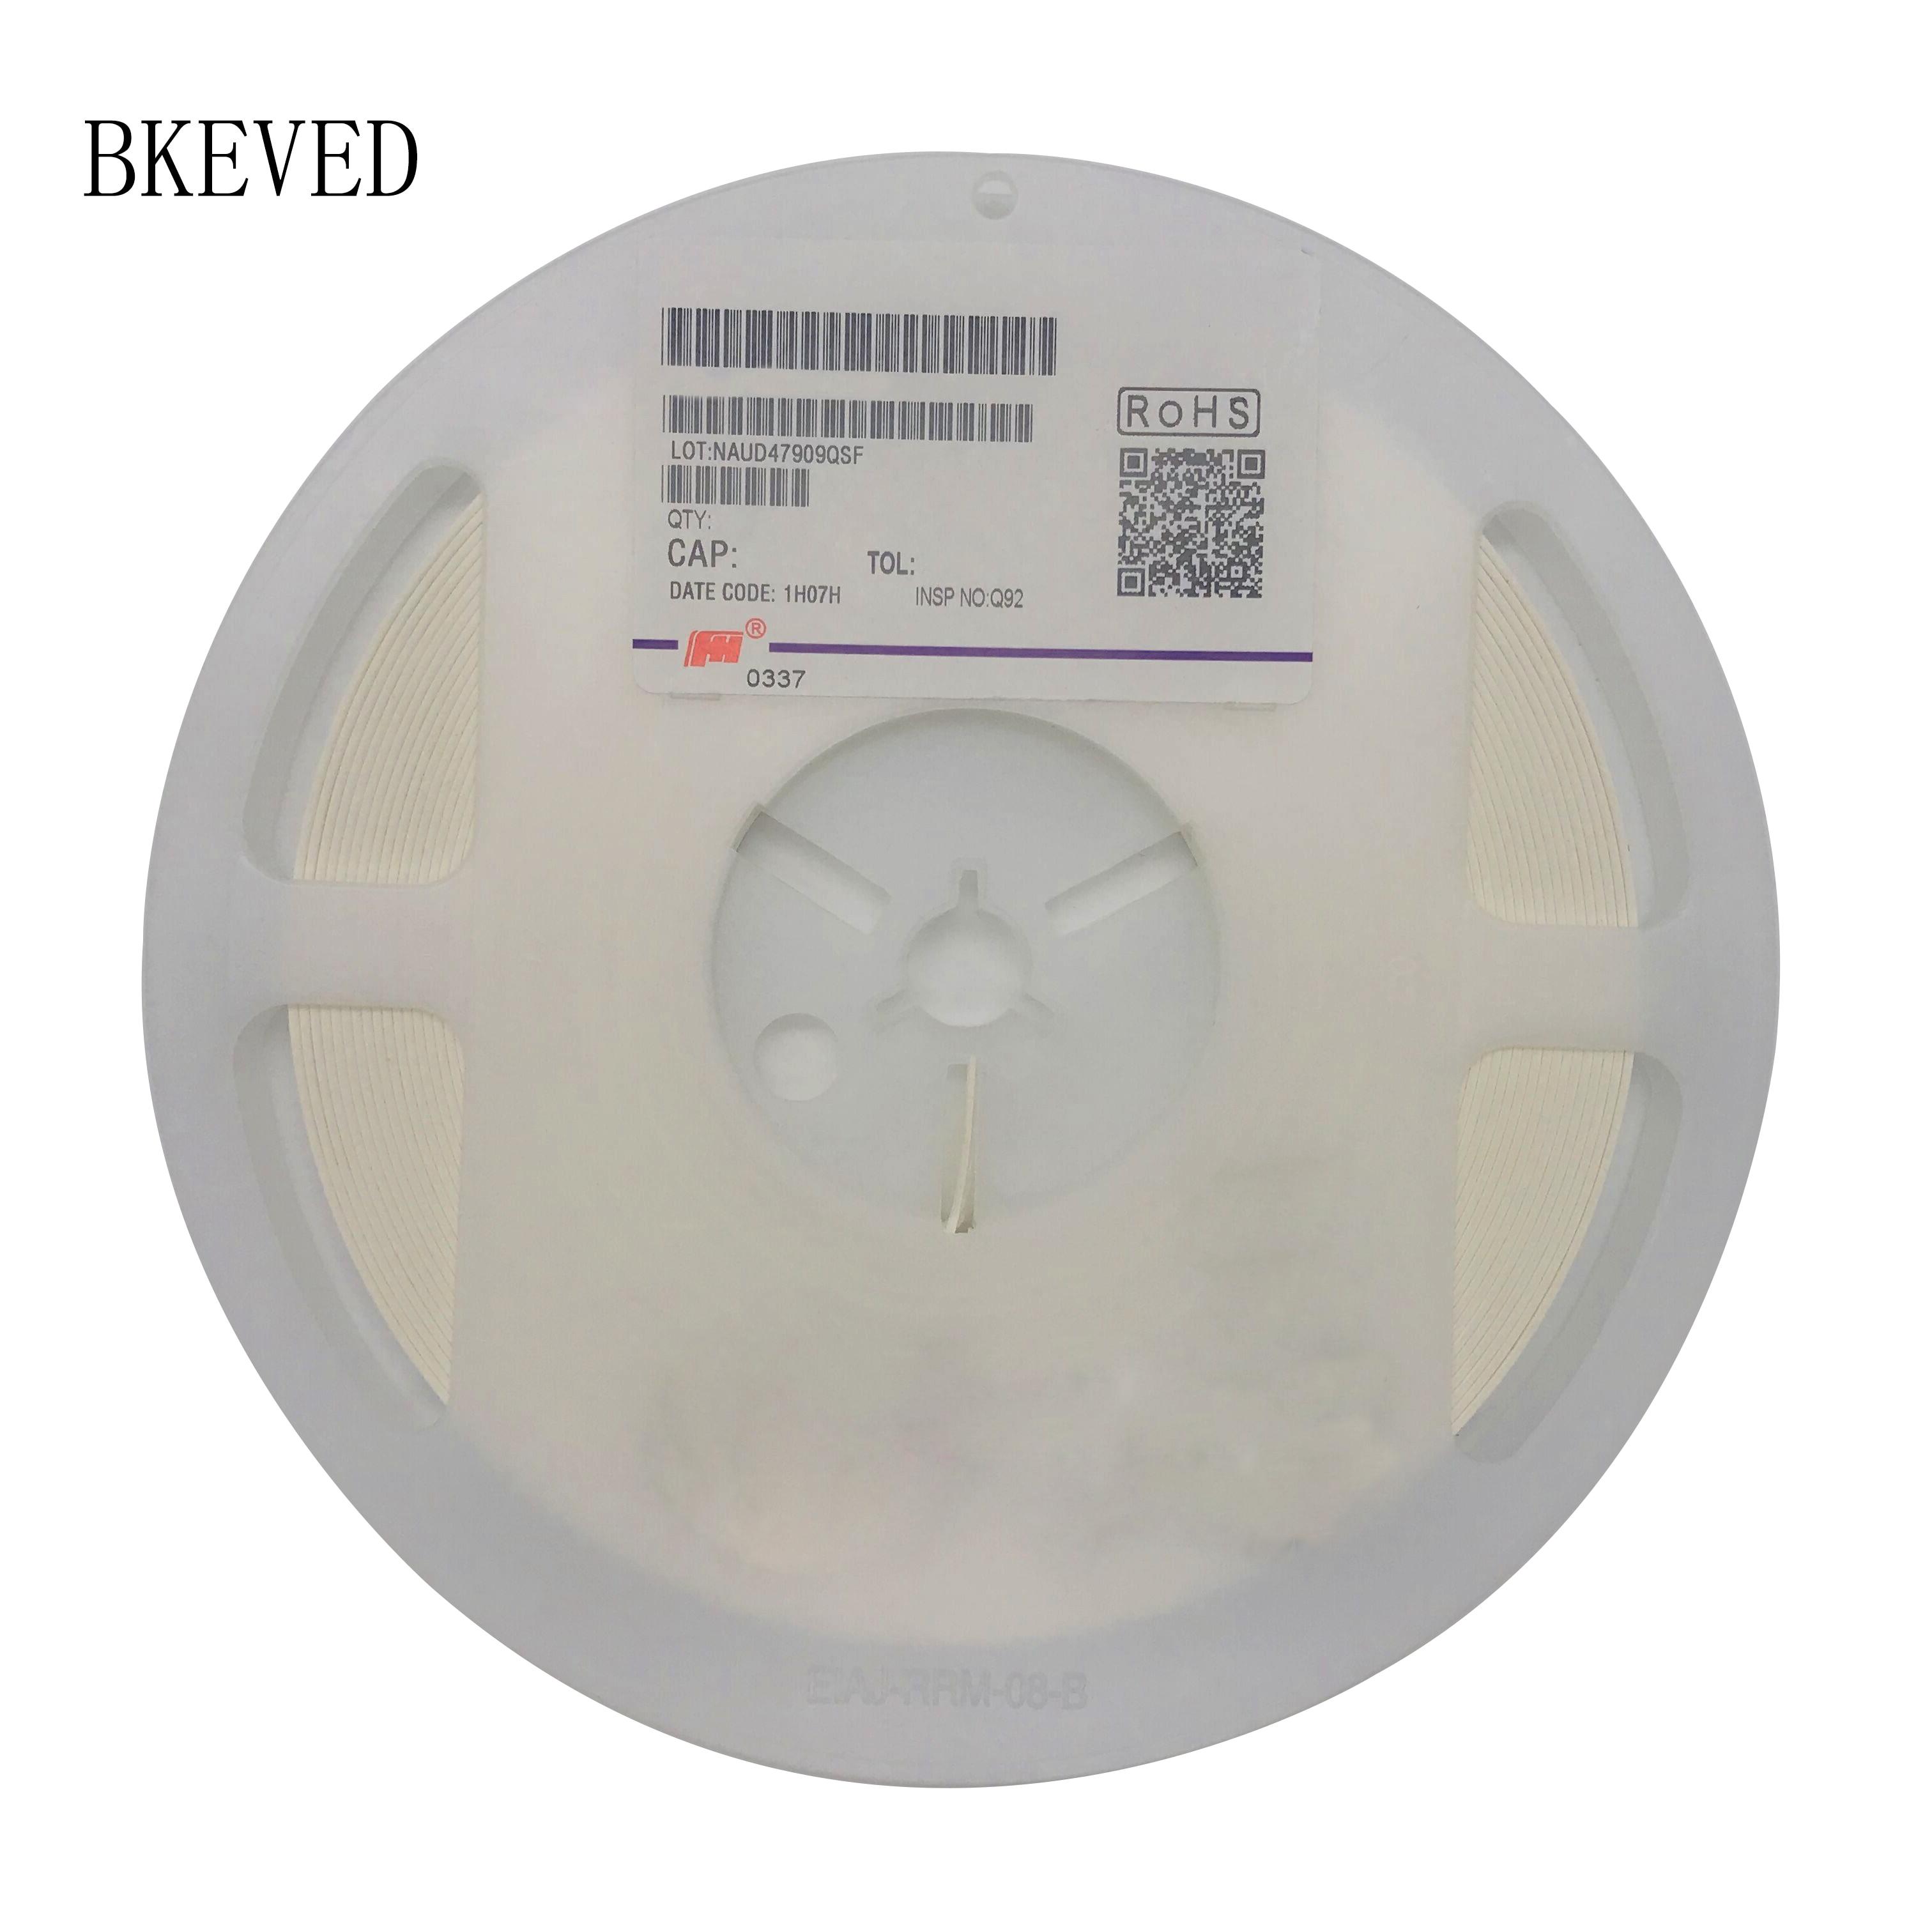 1 carrete 4000 Uds 0805 50V SMD Chip de película gruesa condensador cerámica multicapa 0.5pF-47uF 10NF 100NF 1UF 2,2 UF 4,7 UF 10UF 1PF